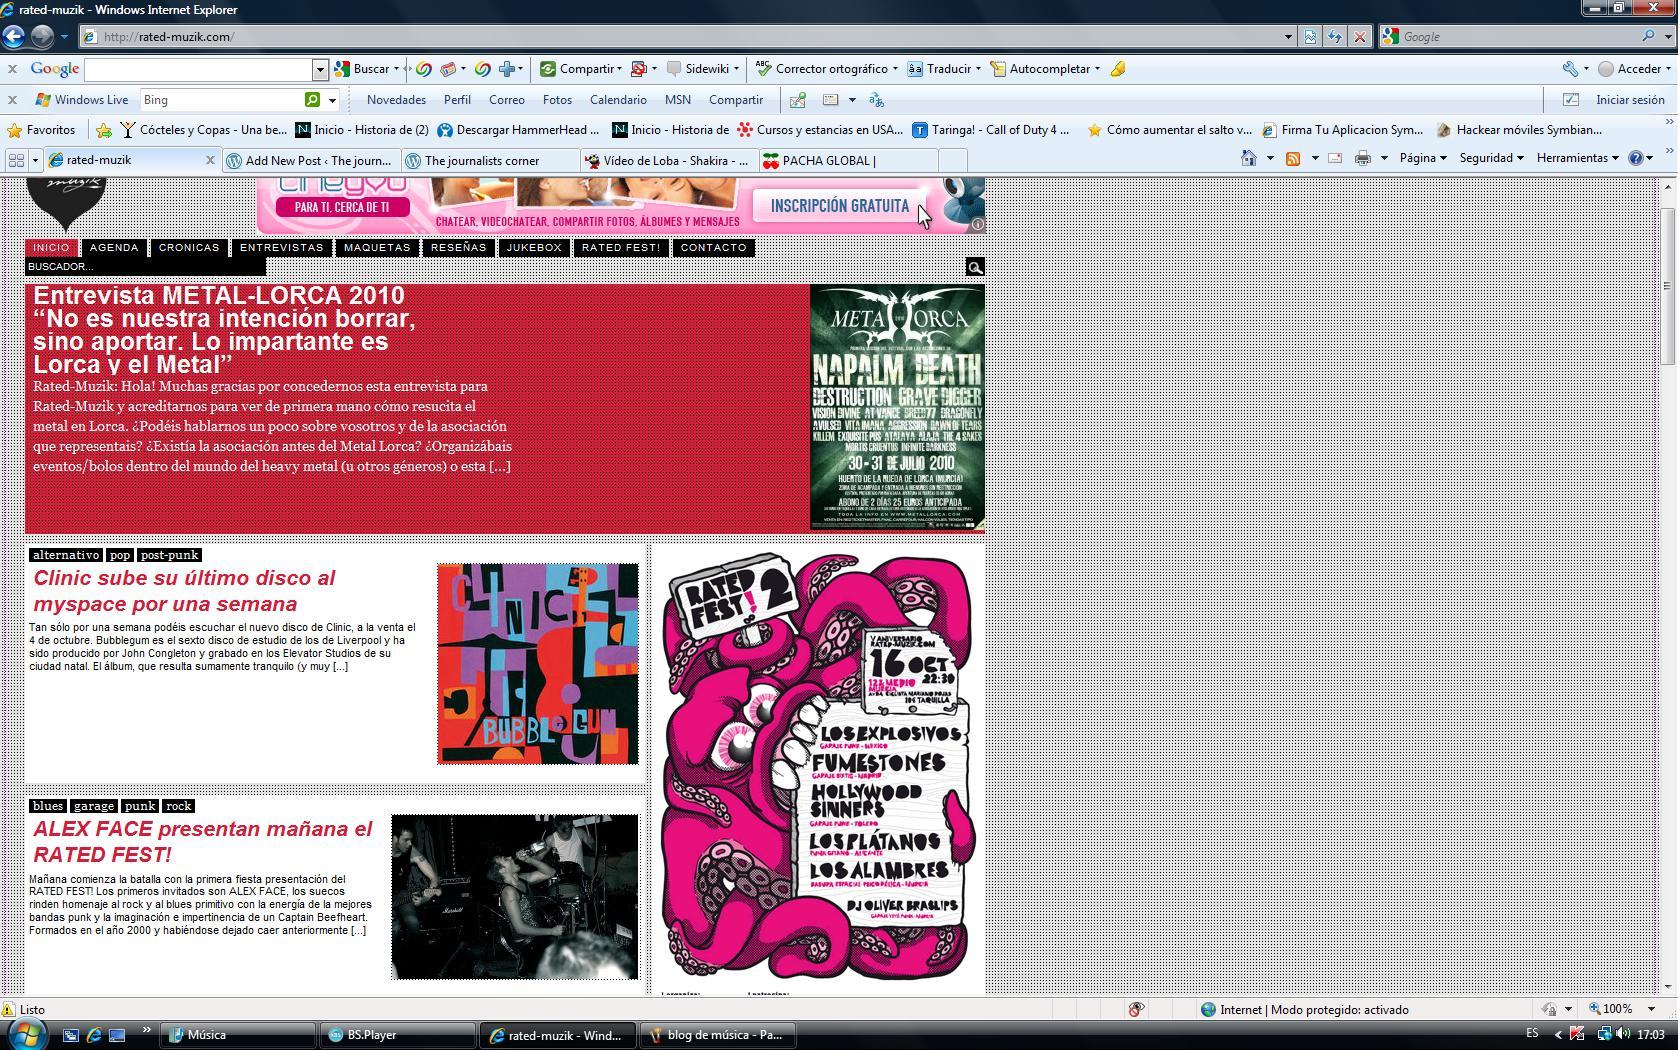 The journalists corner   Just another WordPress.com site   Página 2